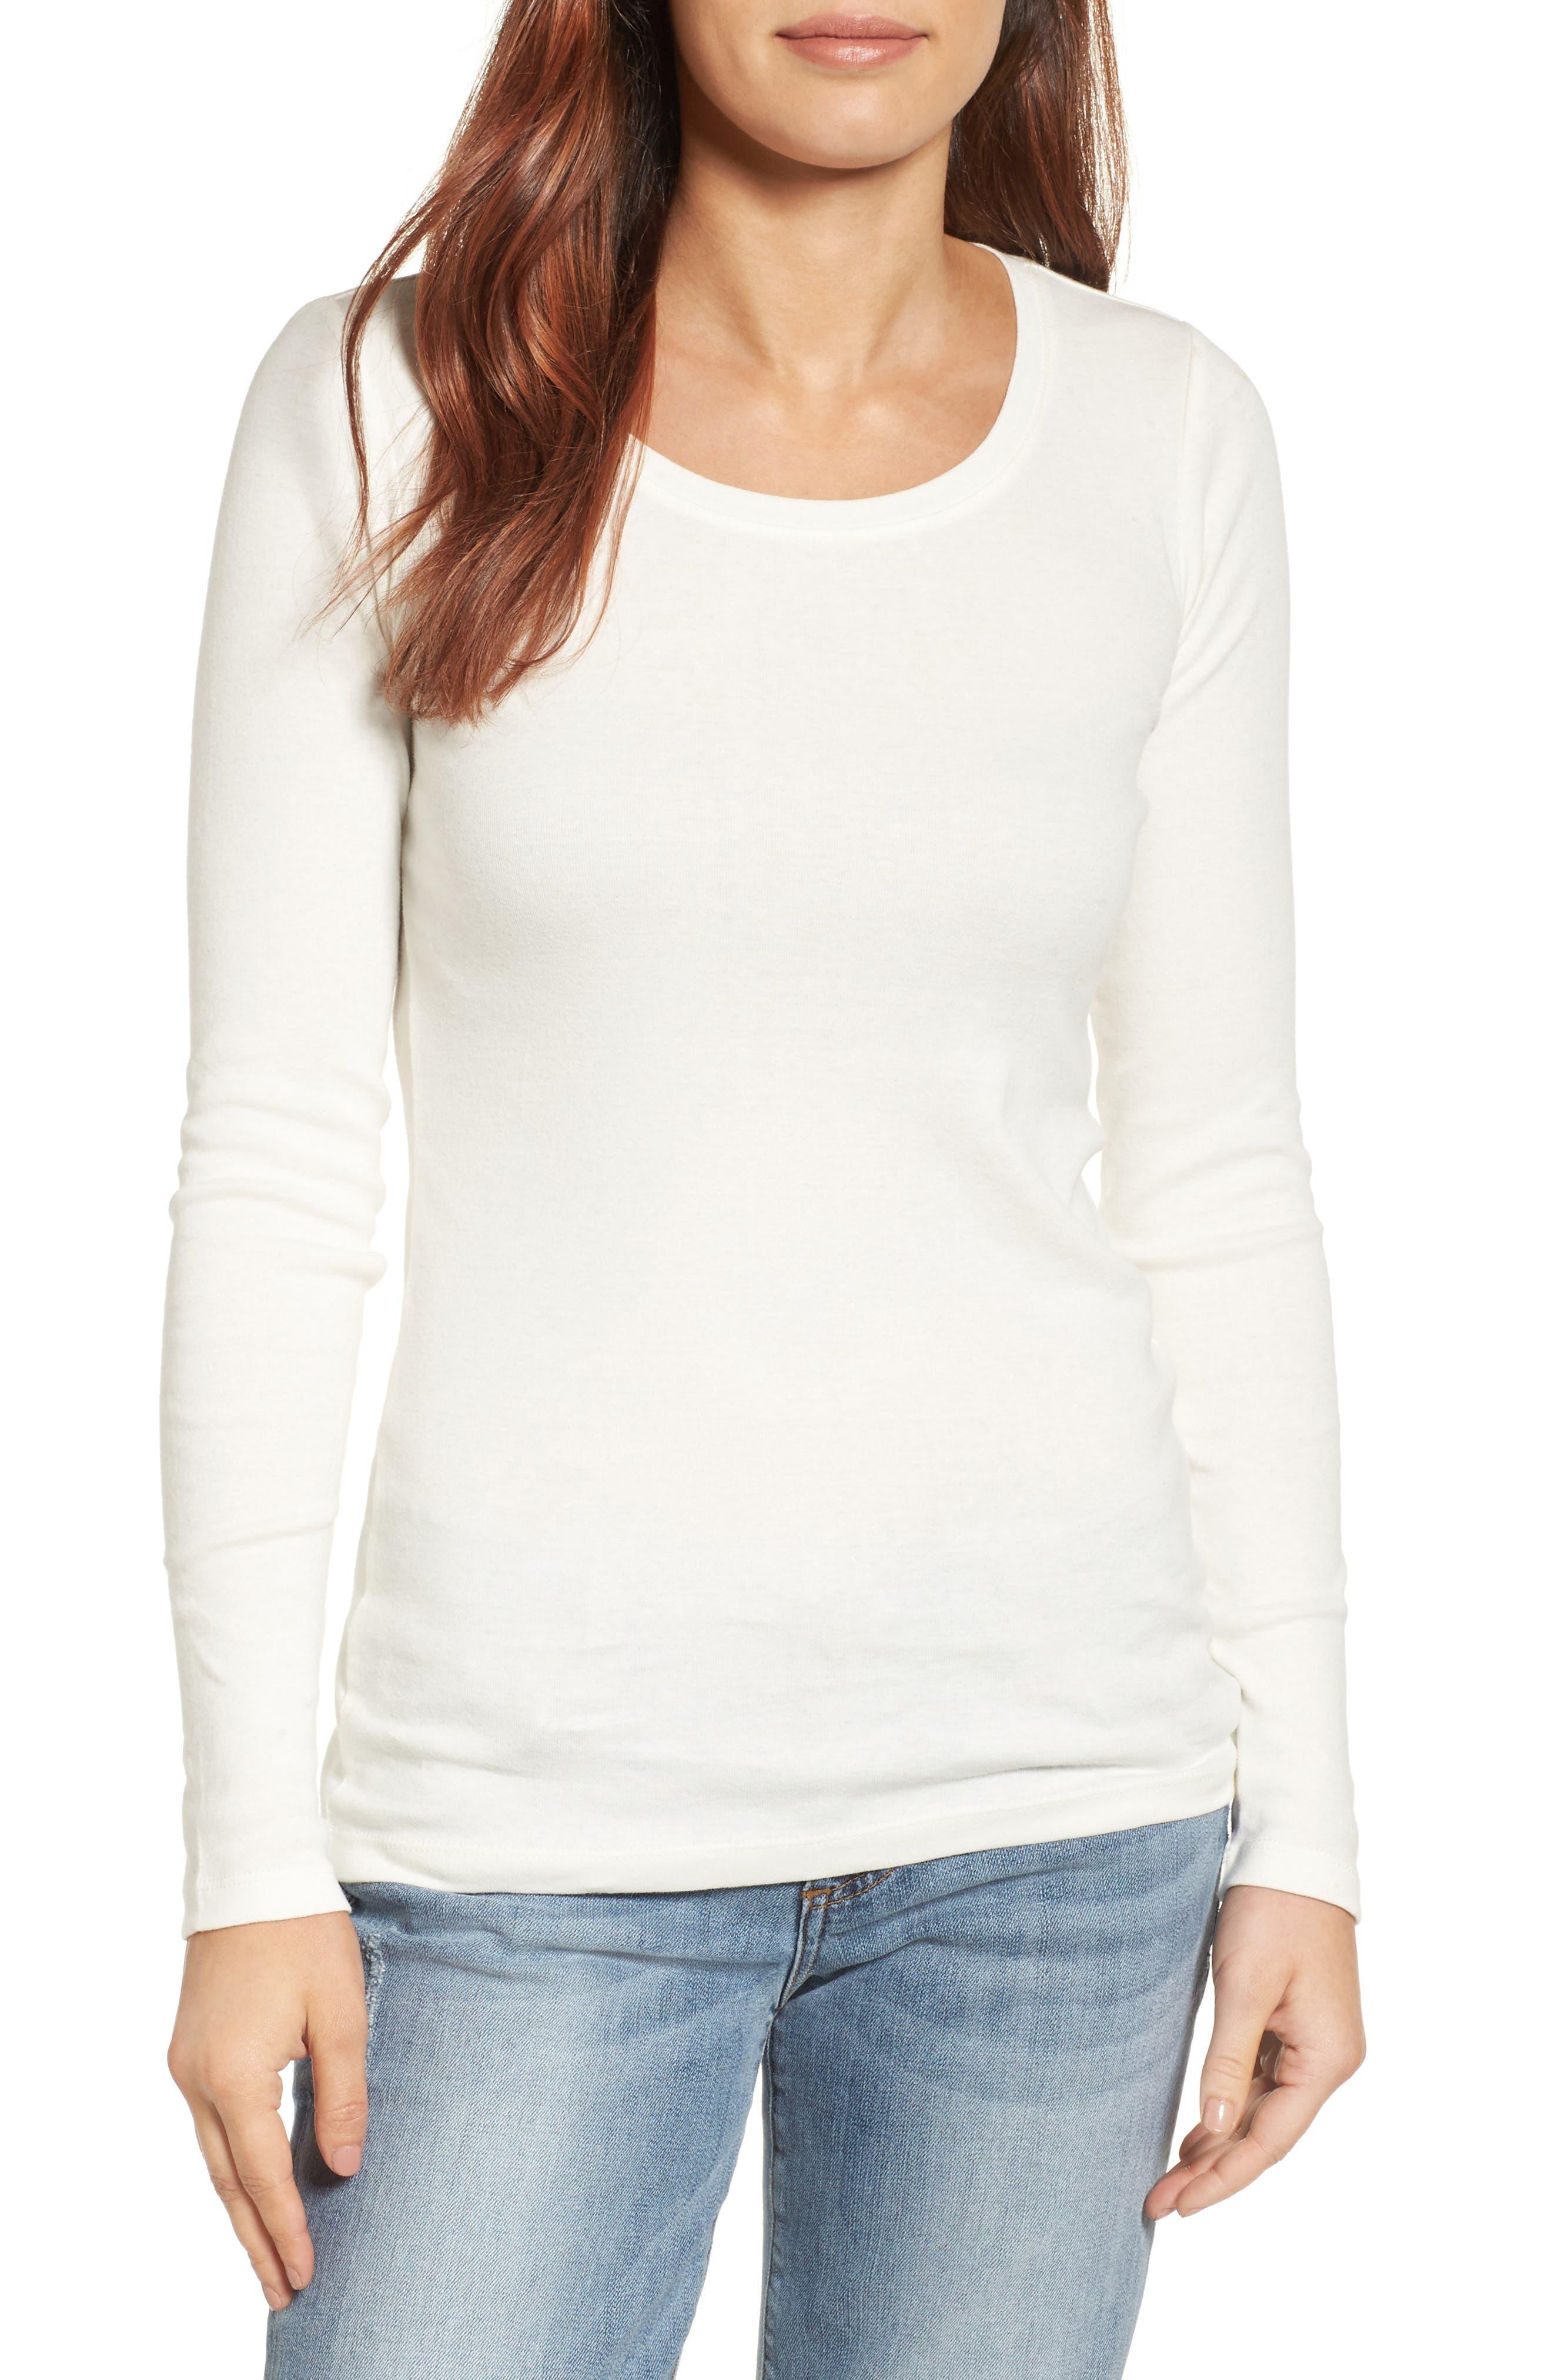 Caslon® Long Sleeve Scoop Neck Cotton Tee (Regular & Petite)